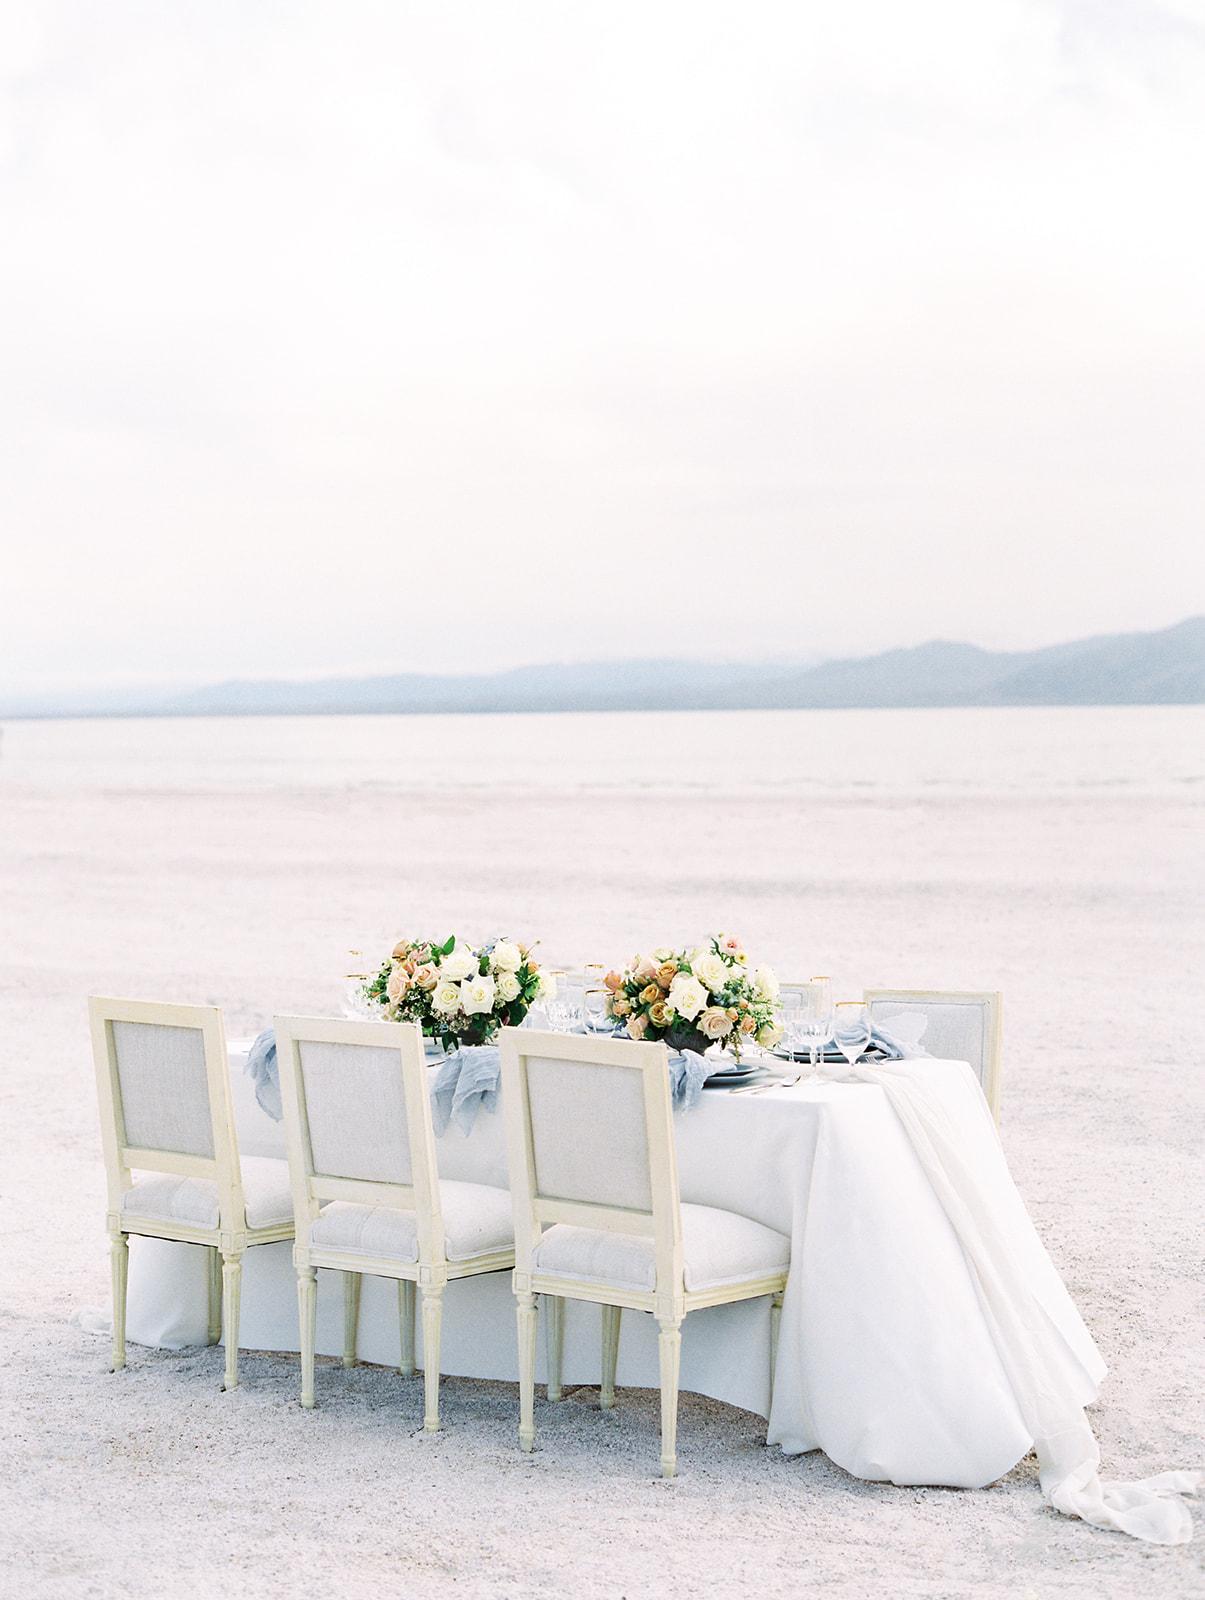 Dreamy Desert Wedding Inspiration